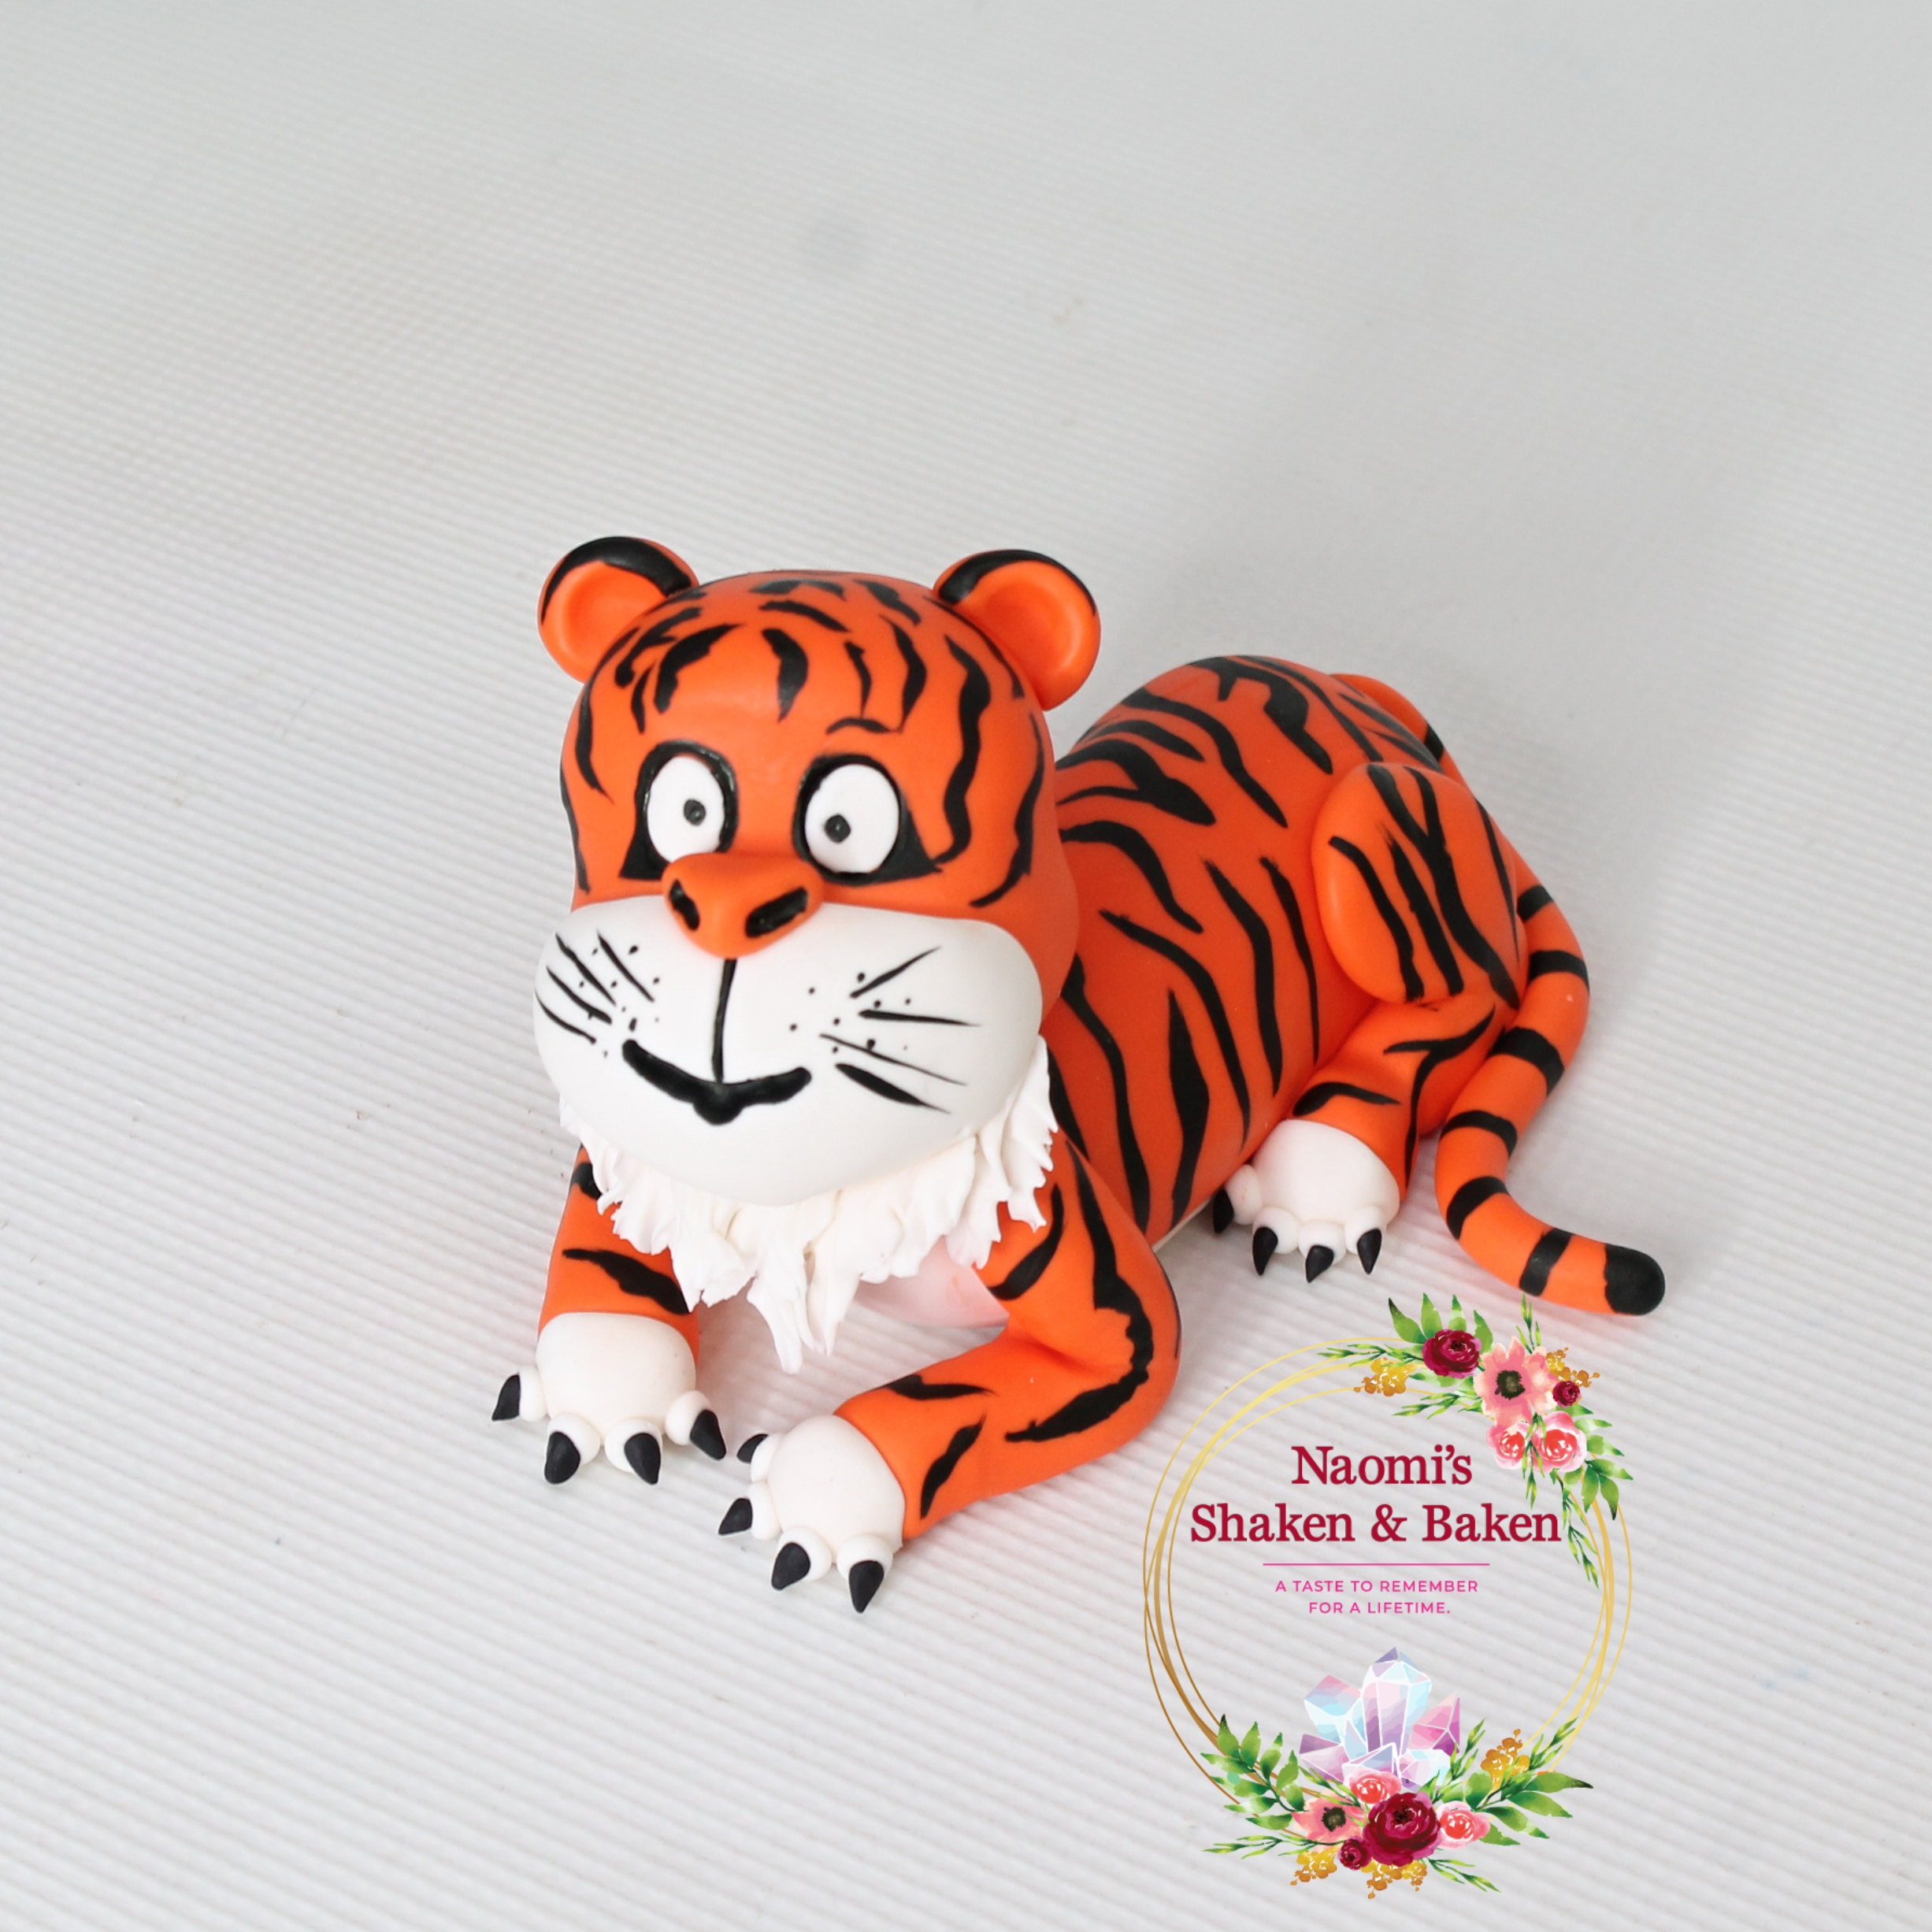 3D Handmade Edible Fondant Tiger Cake Toppper